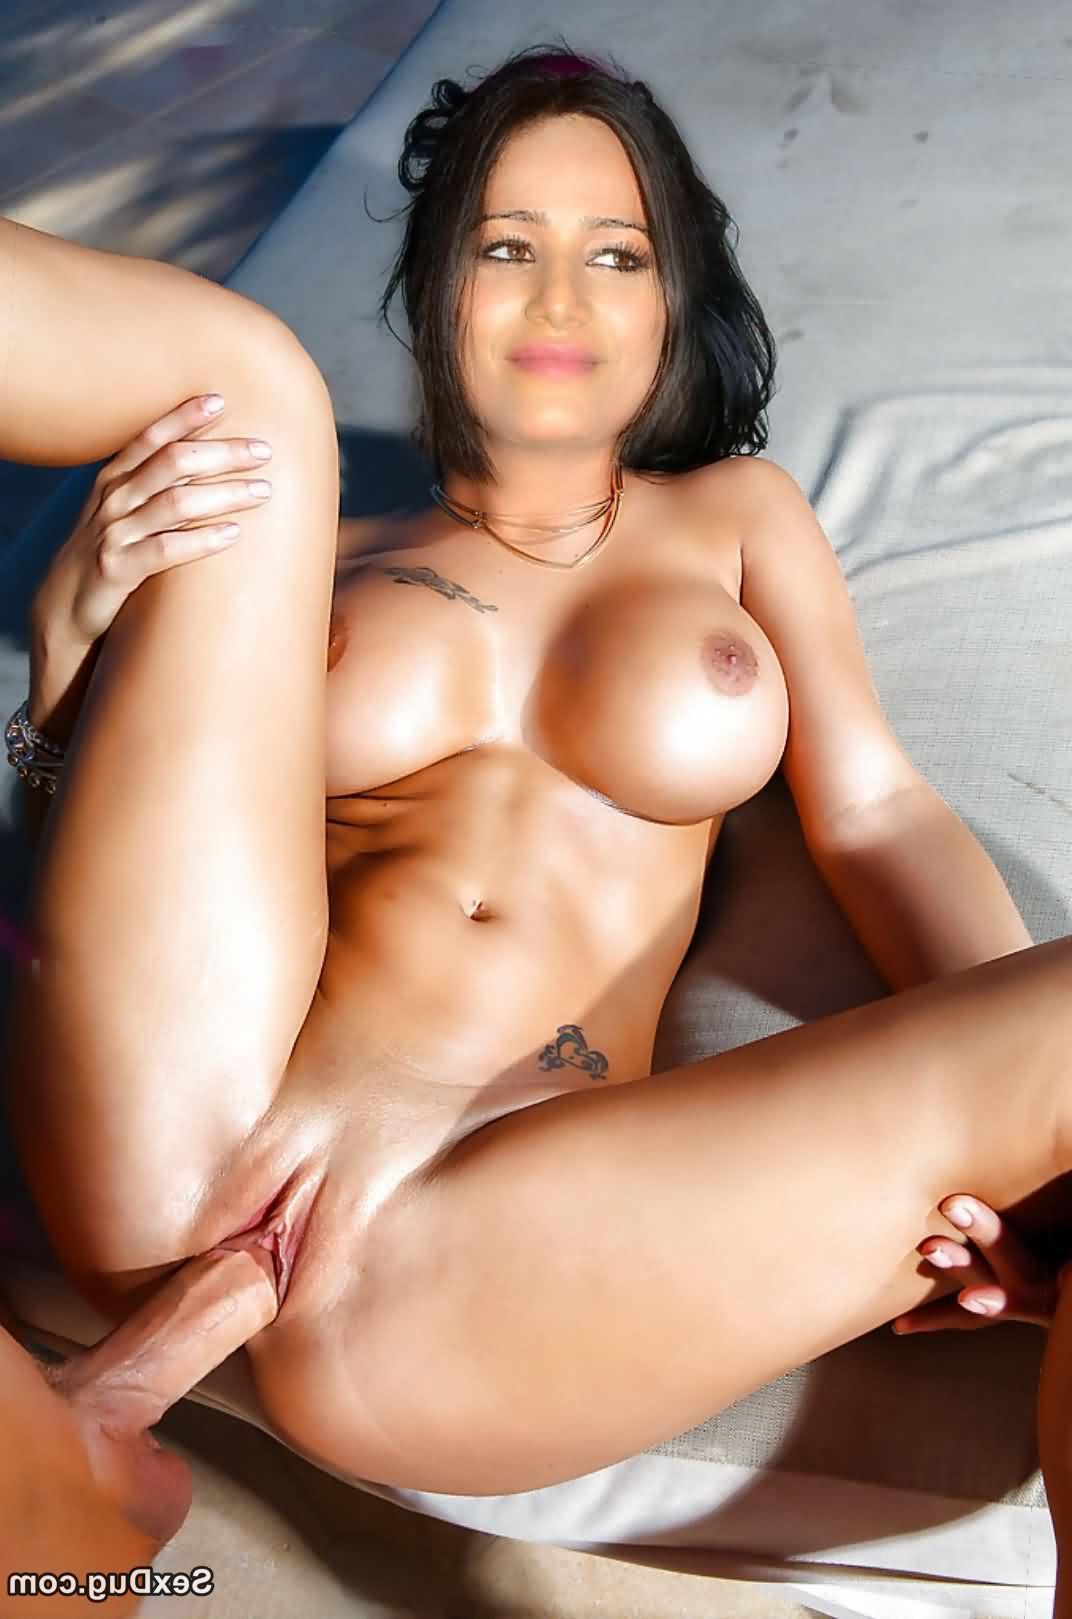 Poonam Pandey sex xxx 6 - Poonam Pandey Nude Hot Sexy Photos